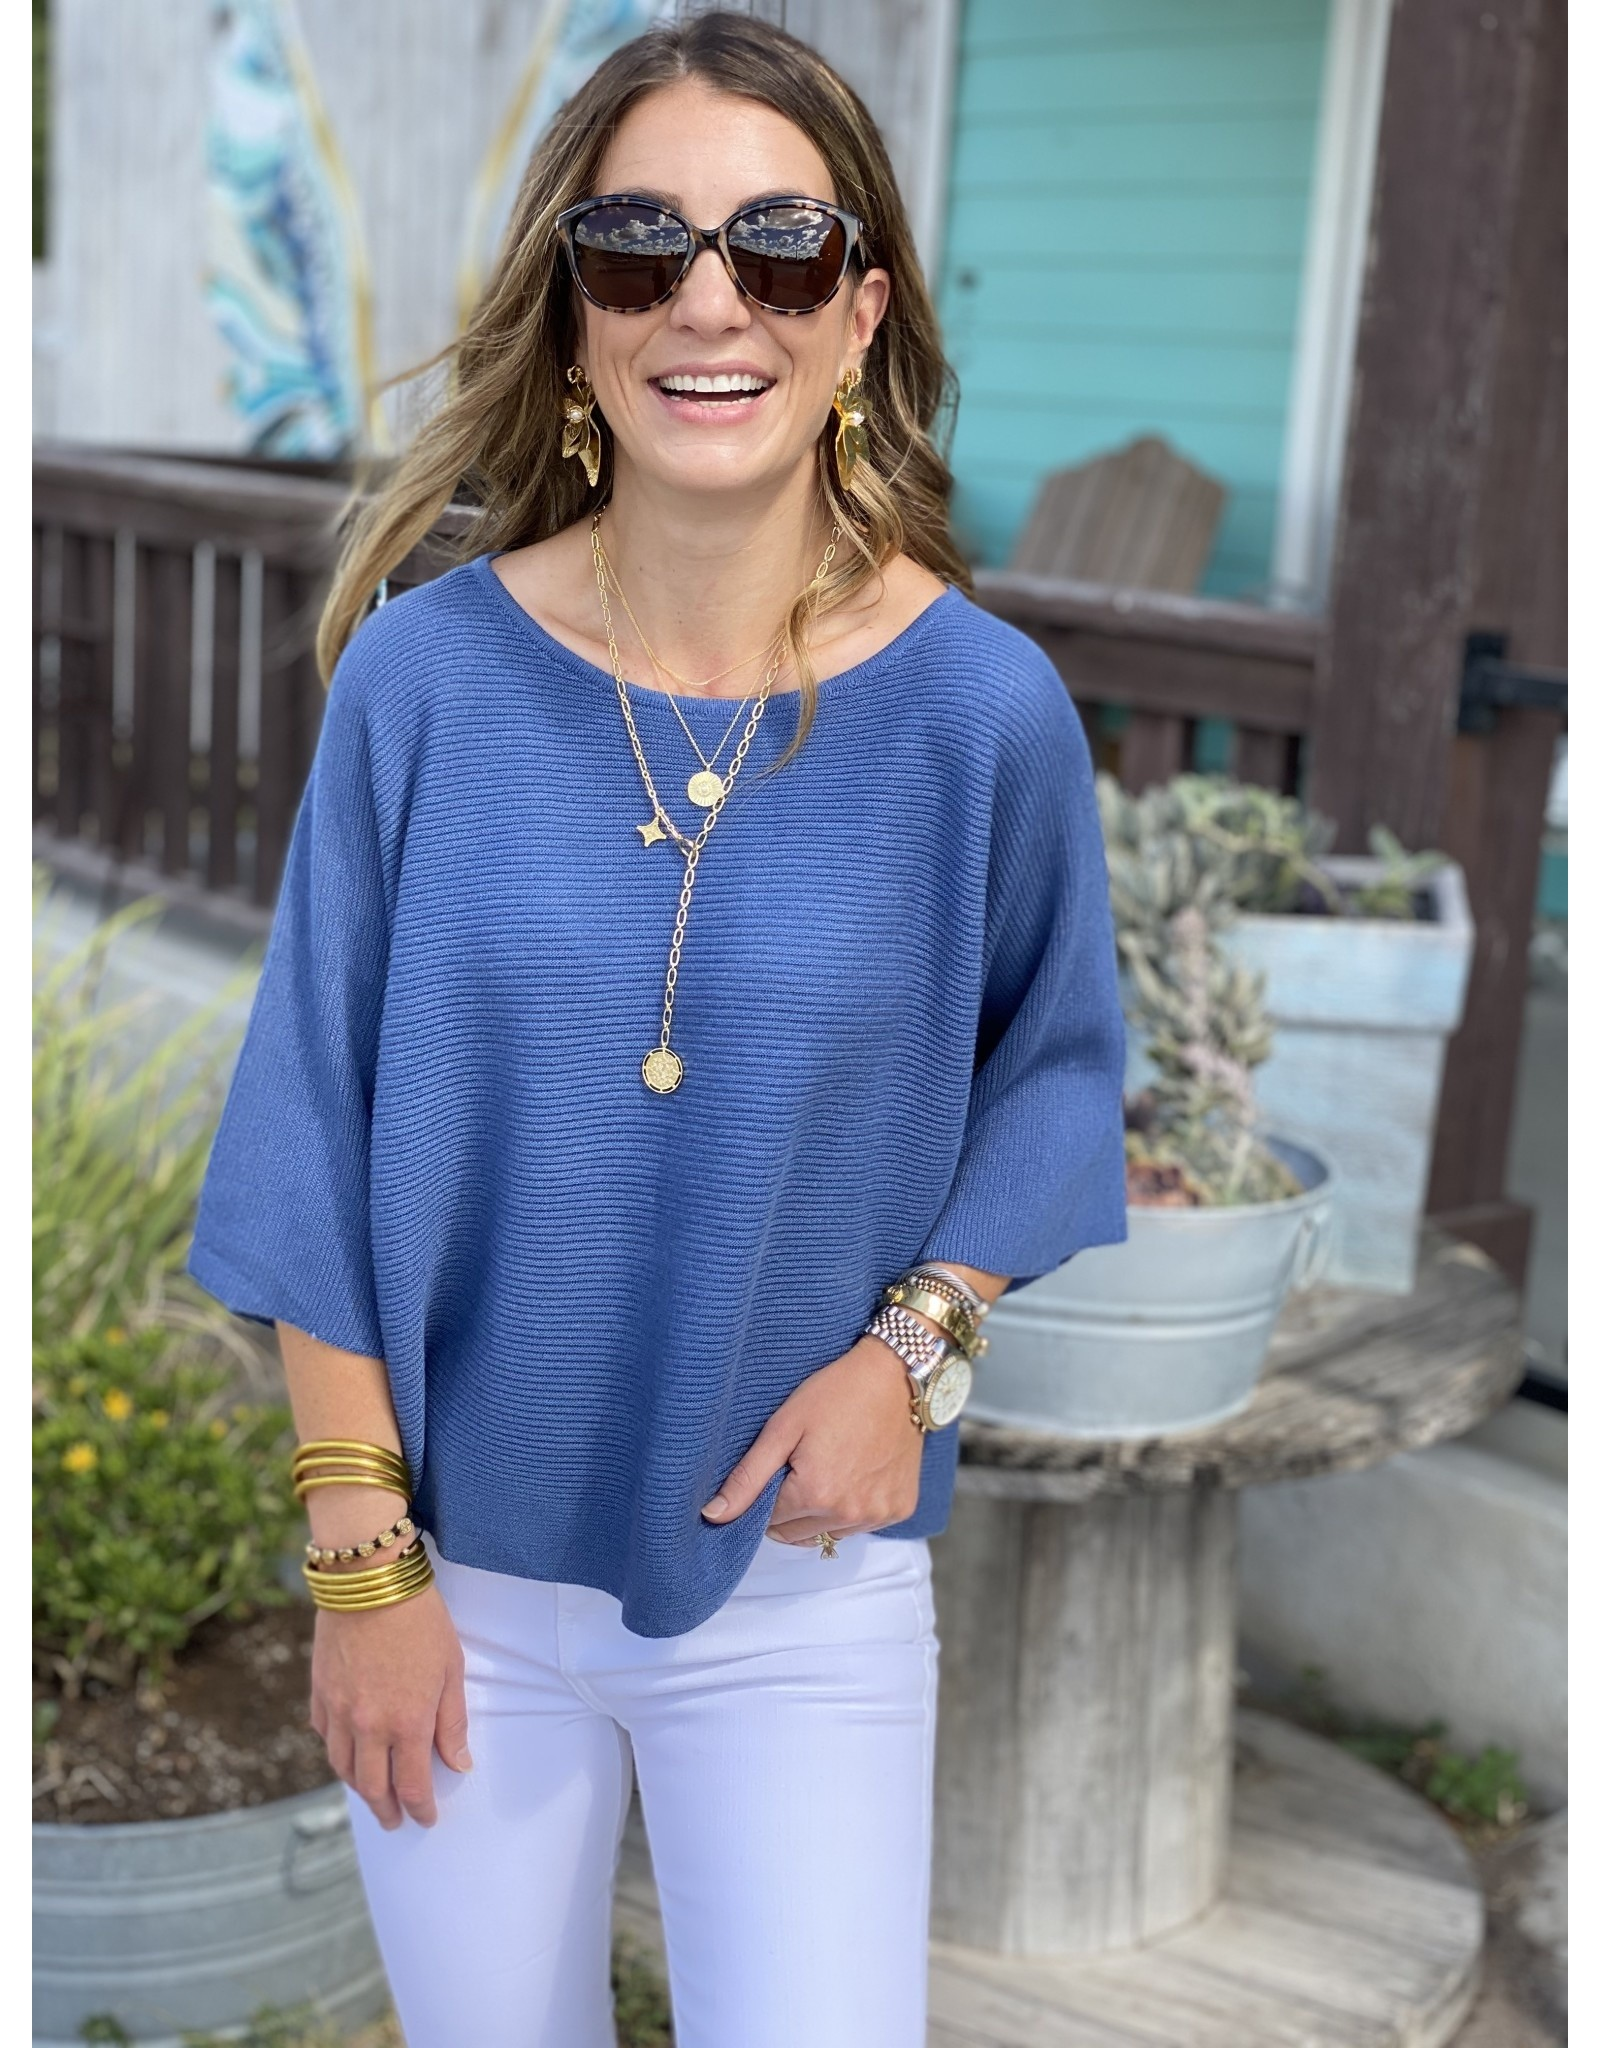 Denim Blue Knit Short Sleeve Top